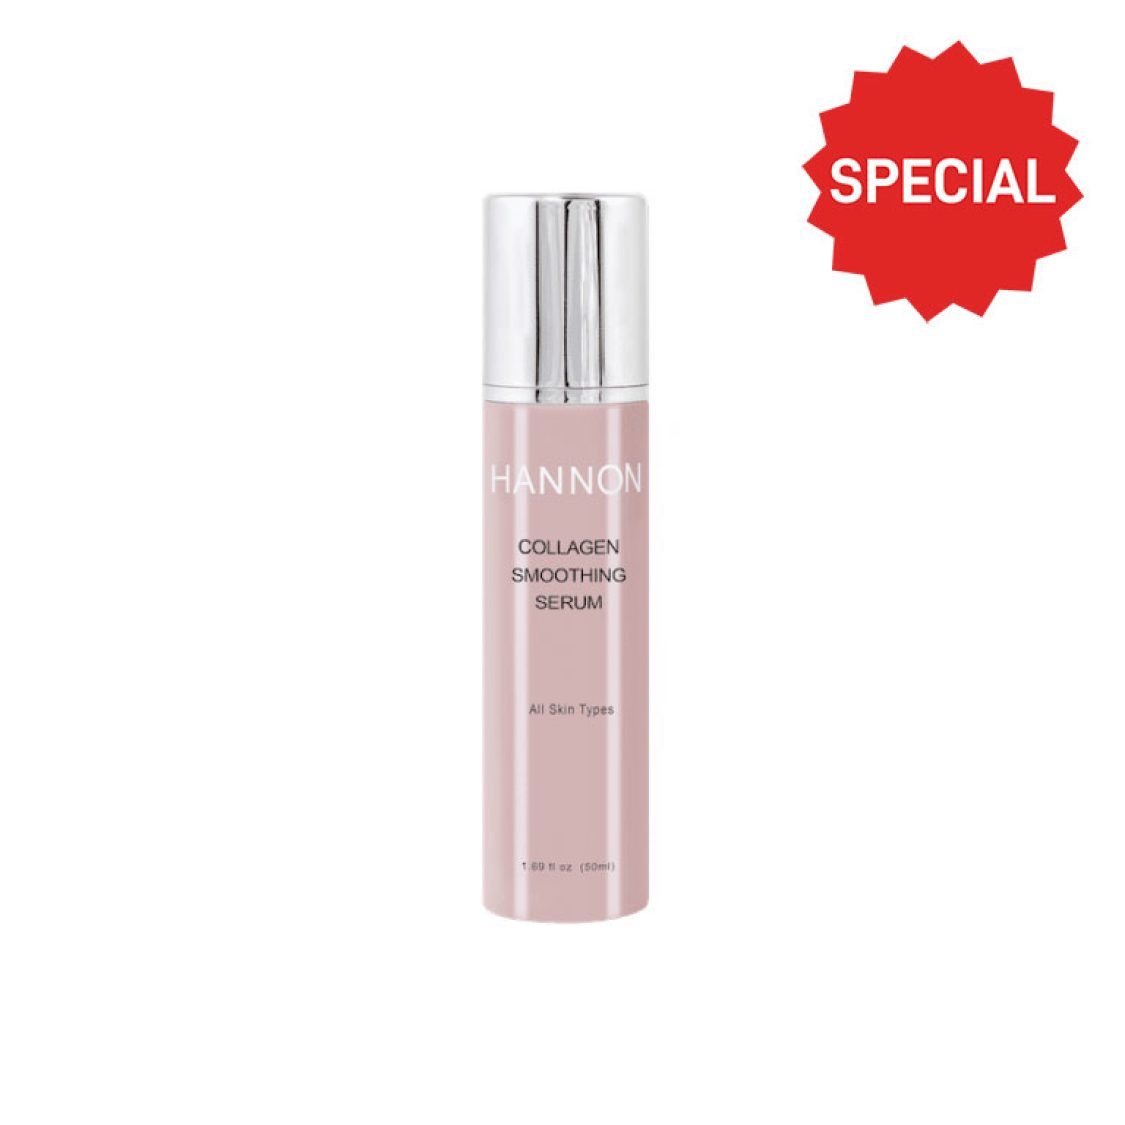 Hannon - Collagen Smoothing Serum 50ml - Plumping